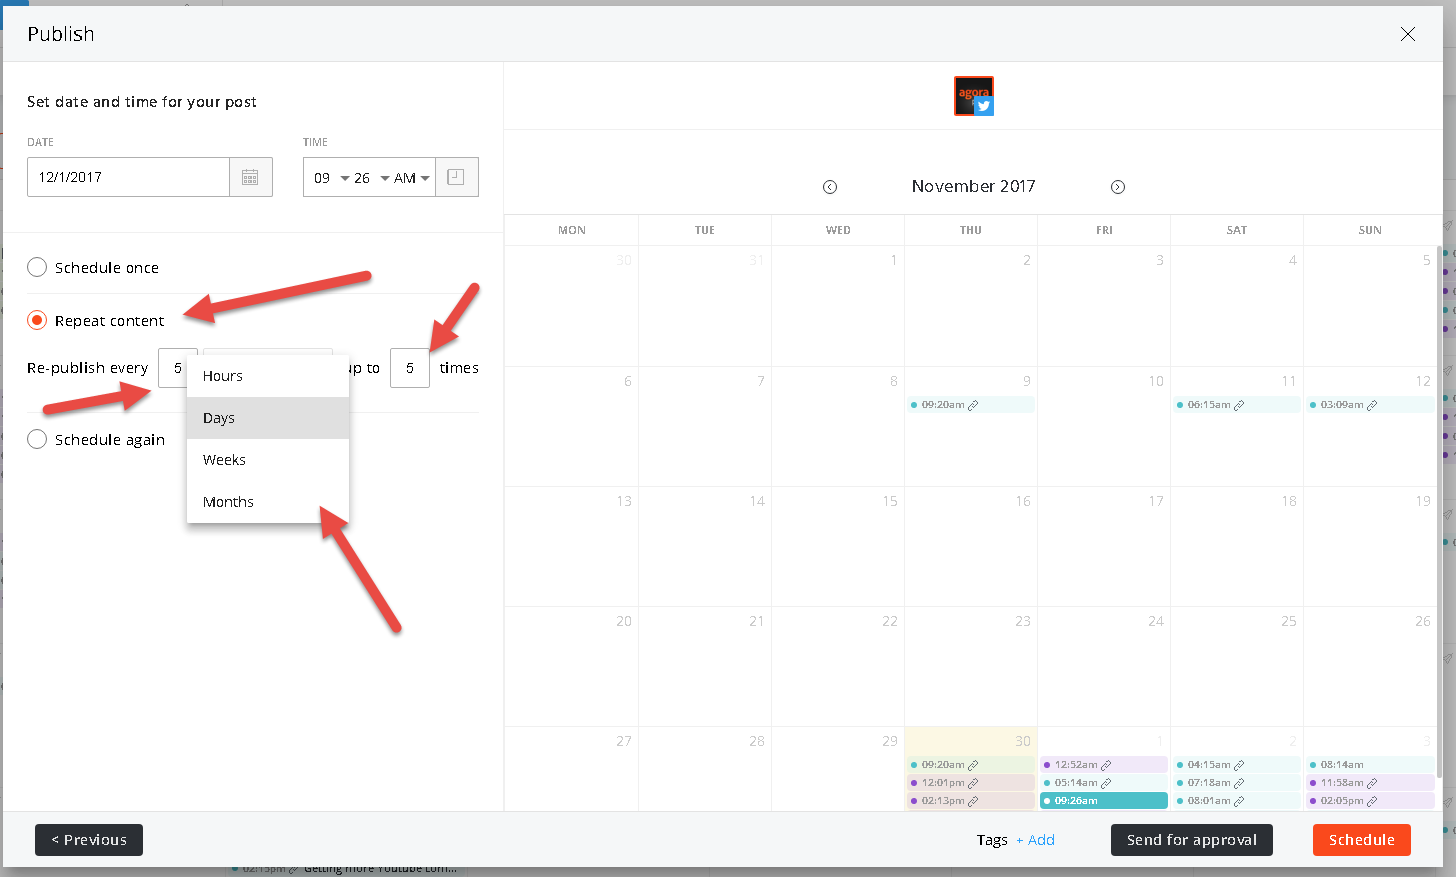 scheduling evergreen content